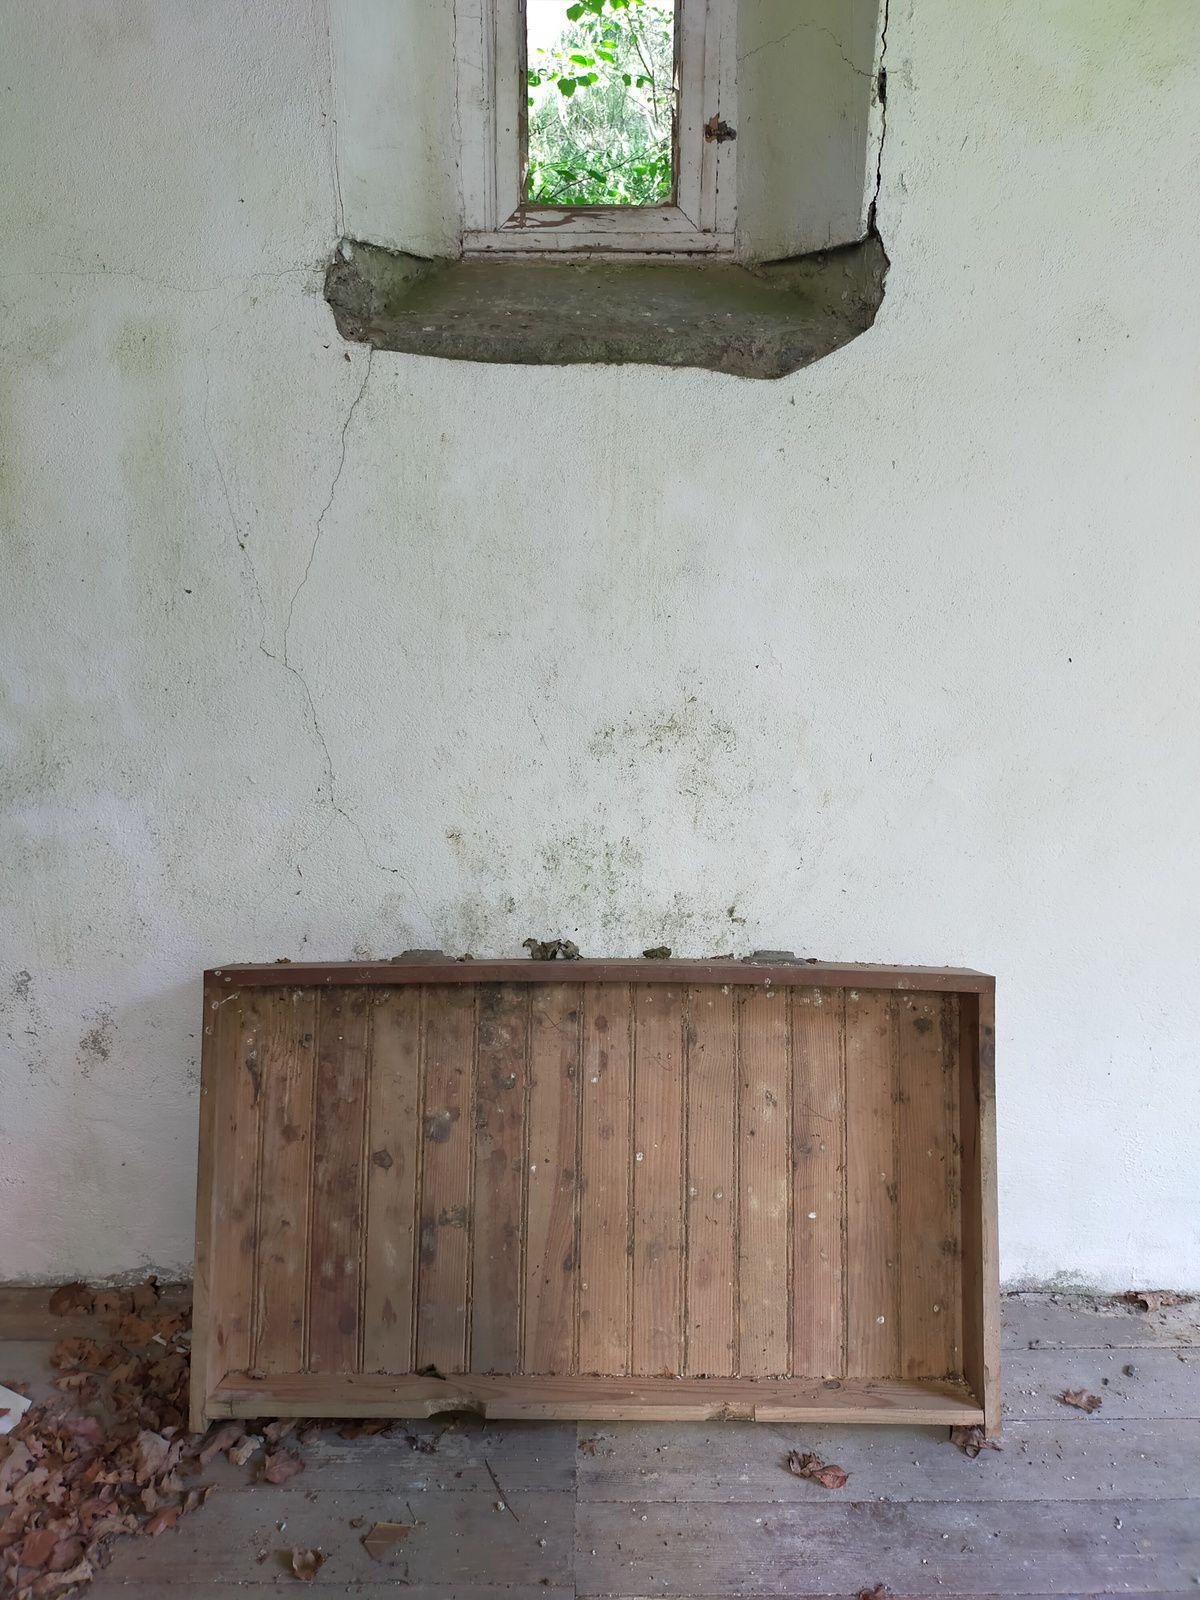 Chapelle Saint- Martin : vandalisme!